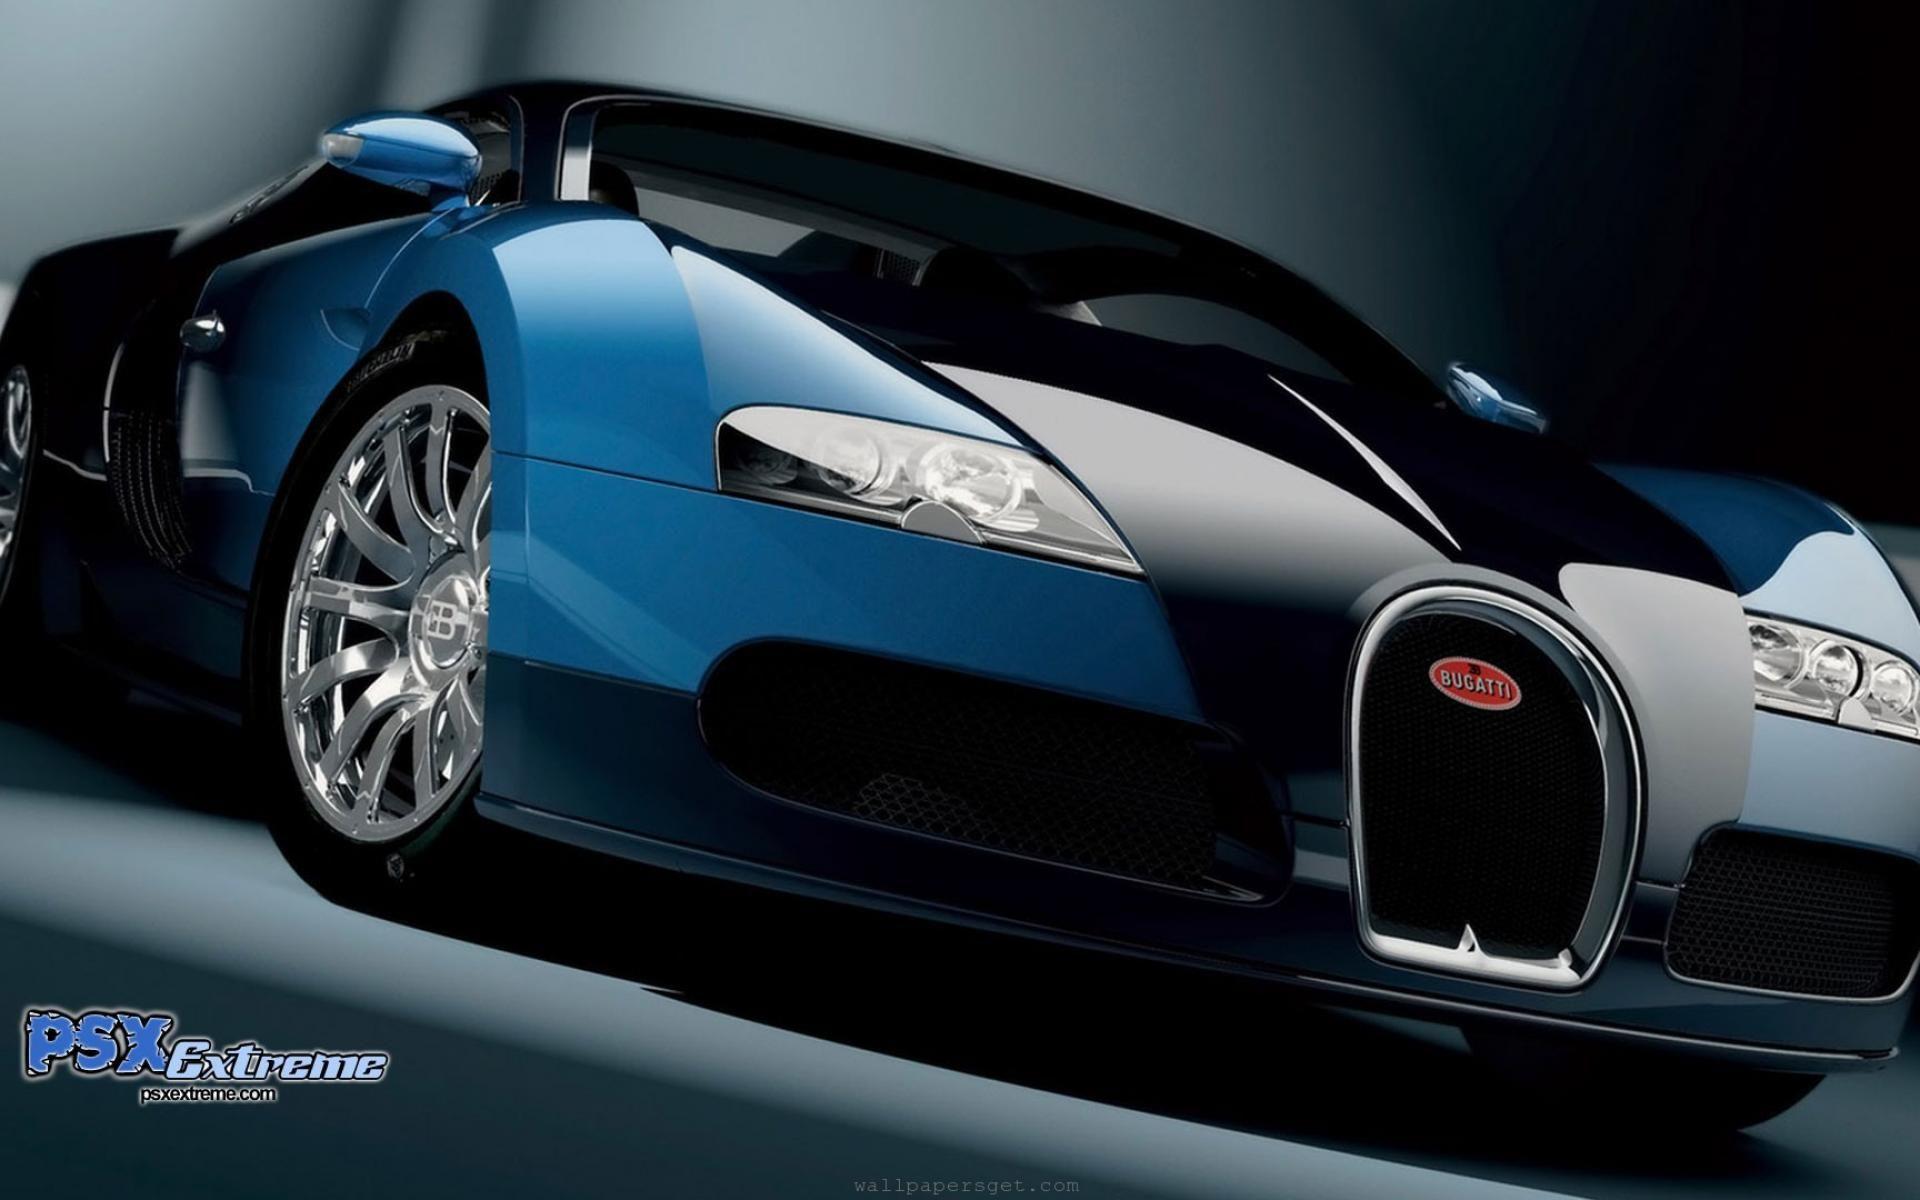 Pics For U003e Fast Cars In The World Wallpaper